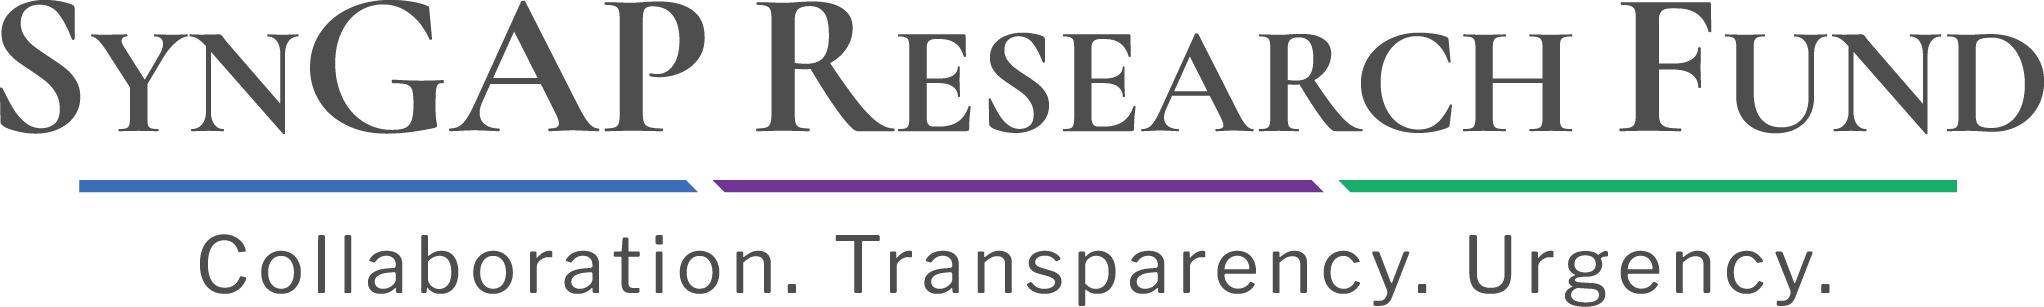 syngap-research-fund-logo_horizontal.jpg